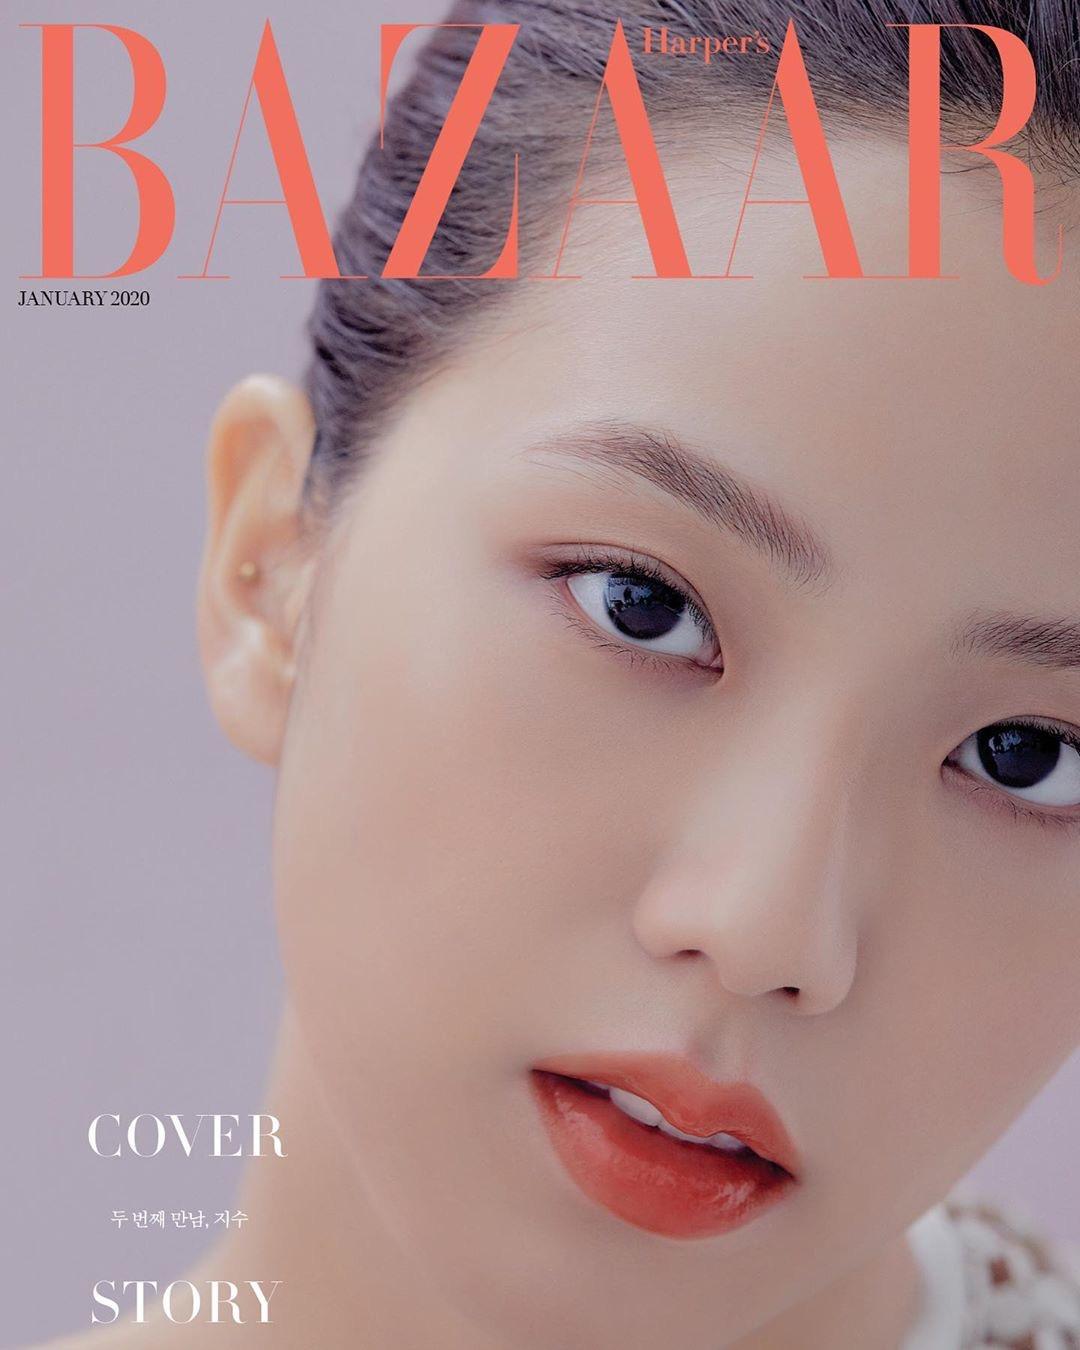 Photoshoot Blackpink Jisoo For Harper S Bazaar January 2020